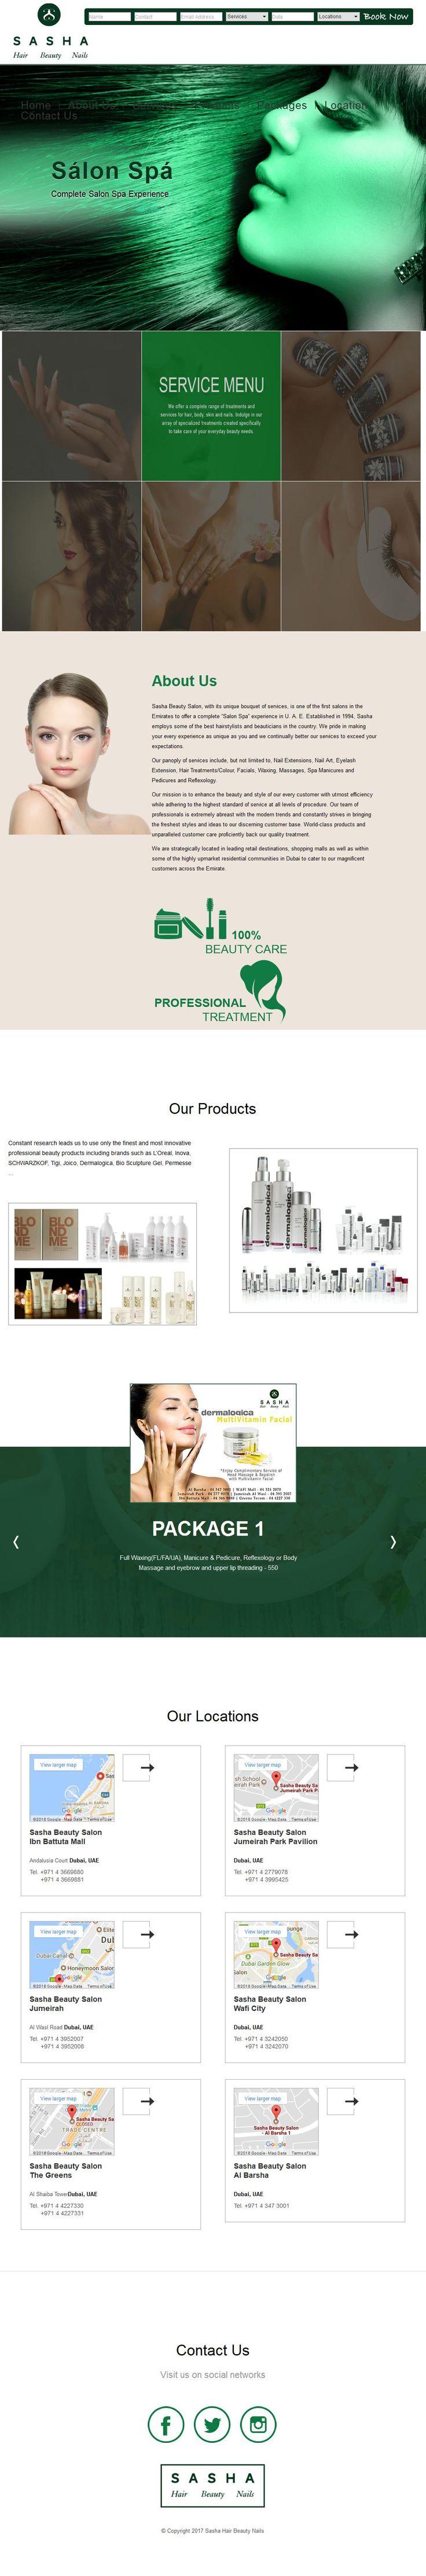 Sasha Beauty Ladies Salon Wafi Mall, 4, Sheikh Rashid Road 1 Floor Umm Hurair 2 - 315, Bur Dubai, Dubai | www.HaiUAE.com is a complete Travel Guide to Dubai, Ajman, Alain, Abu Dhabi, Fujairah, Sharjah, Ras al khaimah, Umm Al Quwain, United Arab Emirates, GCC Countries. Explore more about Megger Distributor in UAE, Valves Actuators Suppliers Dubai, EMPOST, Interior Decorators in Dubai, Al Ghandi Electronics